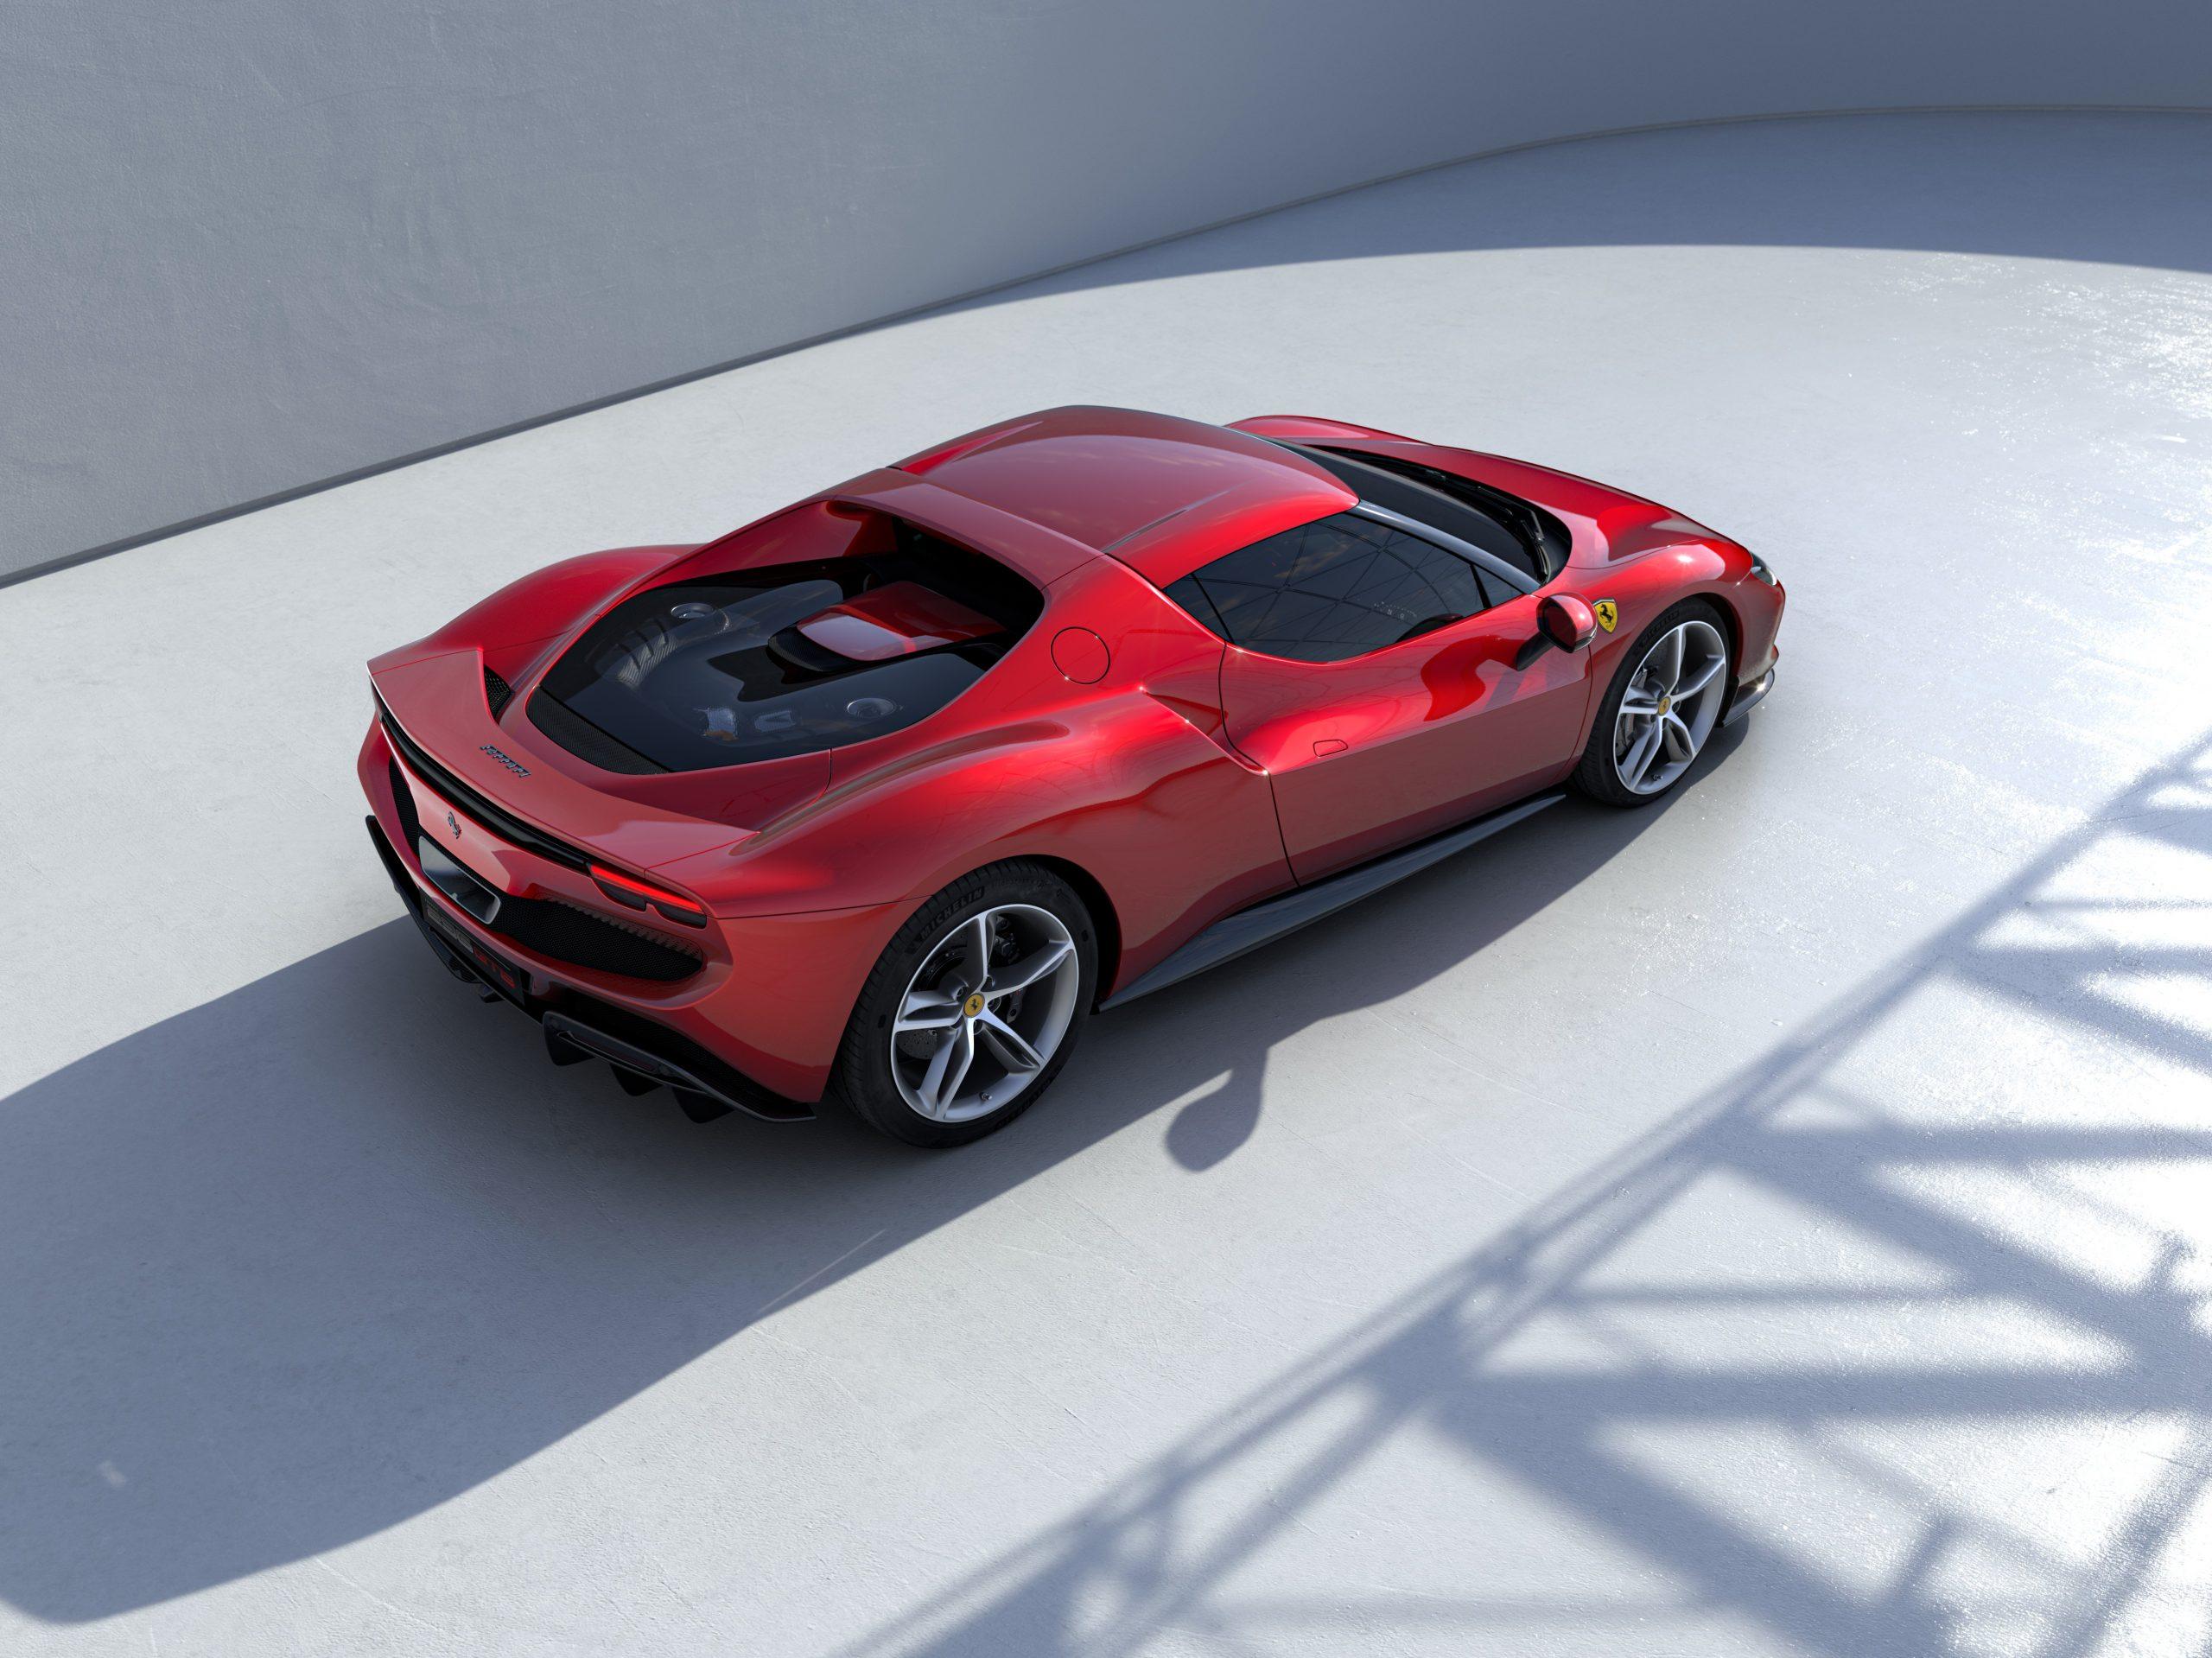 03 296 GTB 34 alto scaled Αυτή είναι η νέα Ferrari 296GTB 296GTB, Ferrari, Ferrari 296GTB, supercar, supercars, zblog, ειδήσεις, Νέα